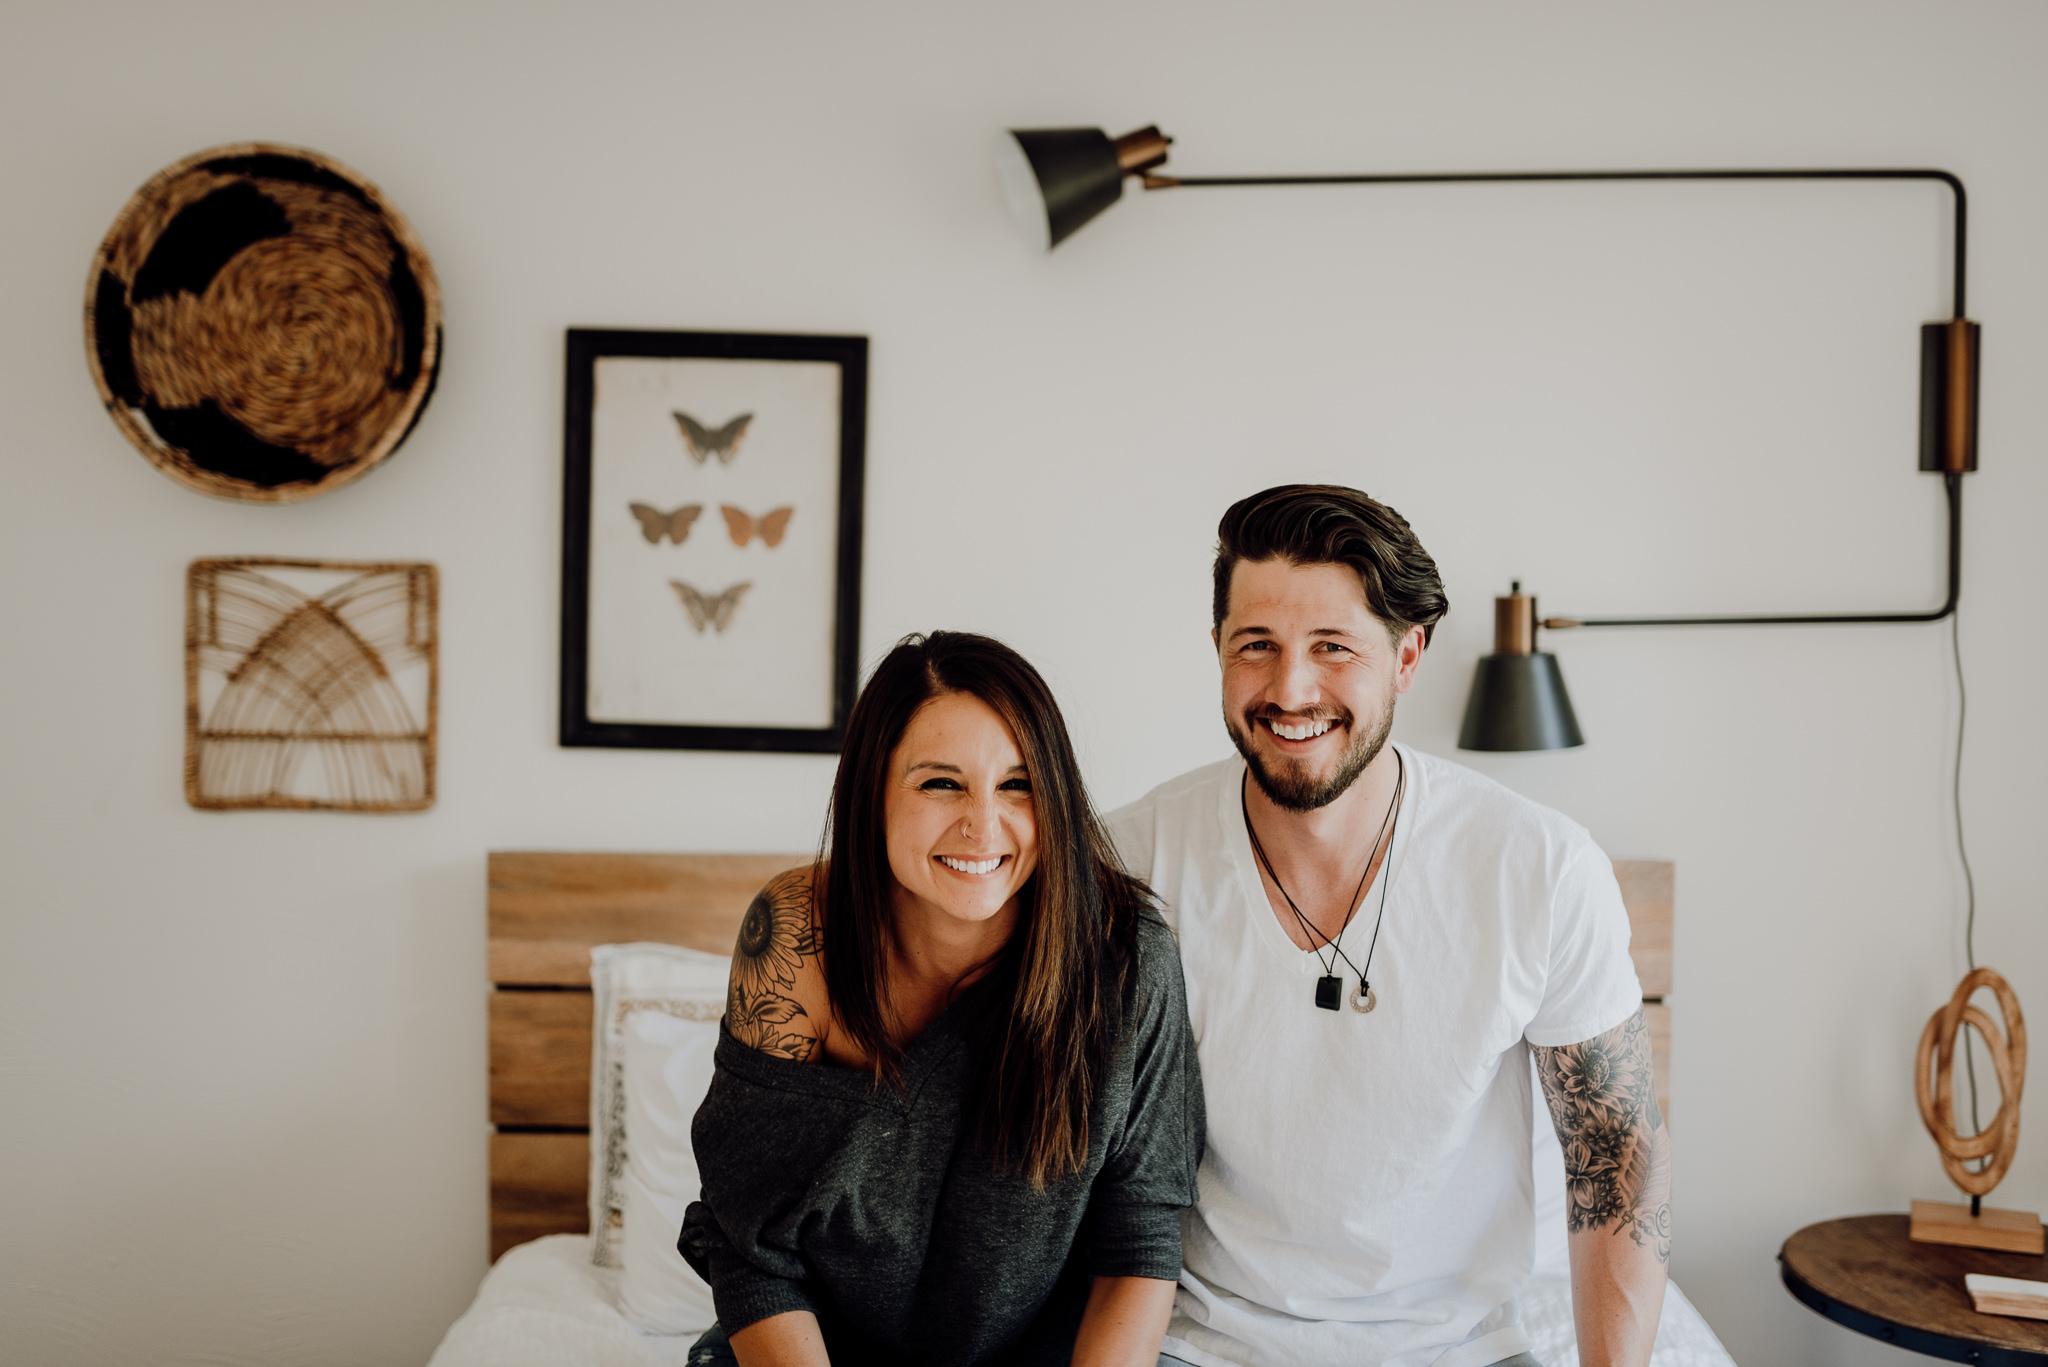 kristen giles photography | texas-wedding-elopement-photographer-oklahoma airbnb session-20-blog.jpg